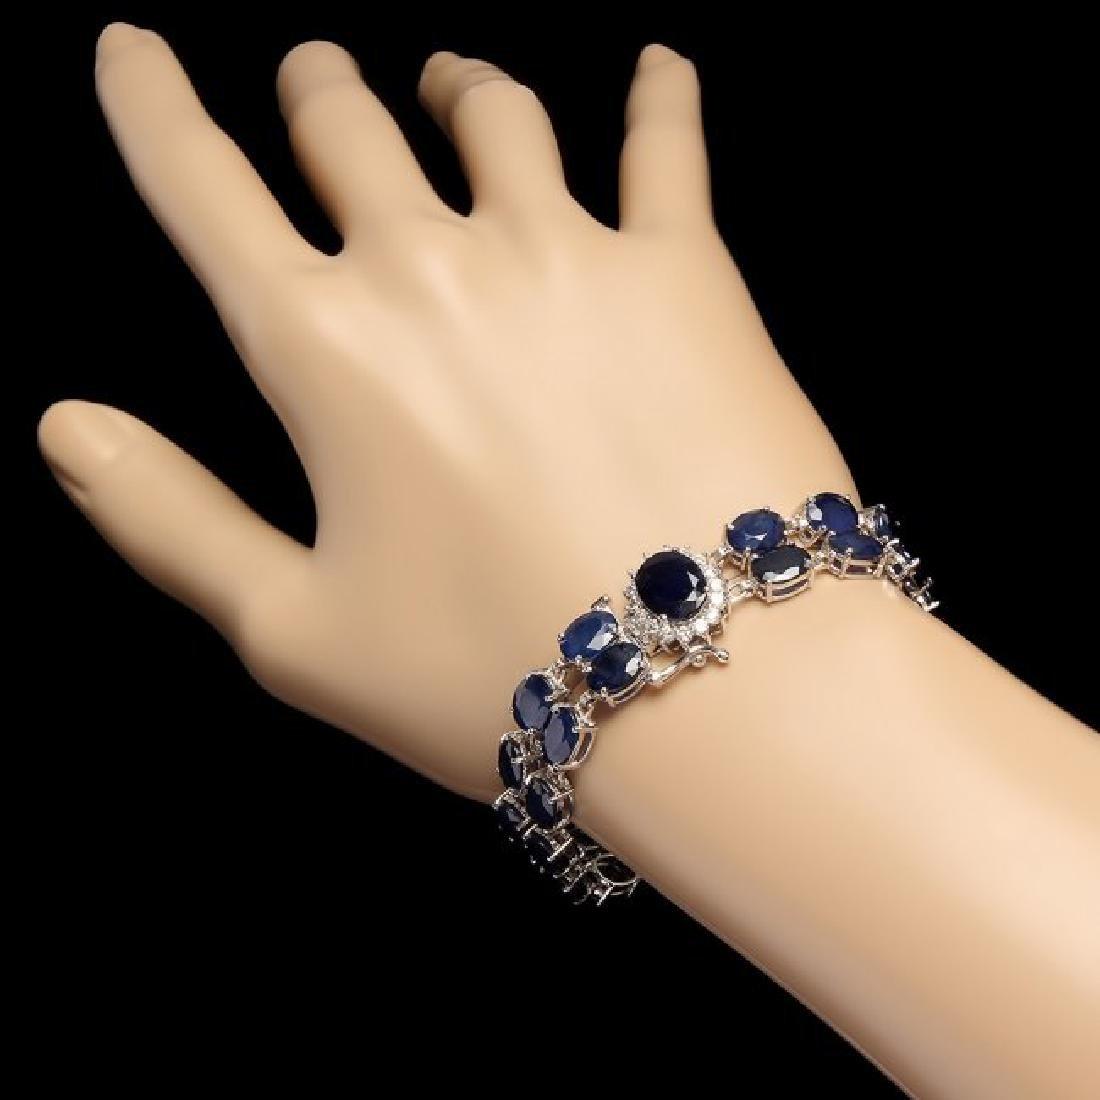 14k Gold 49.5ct Sapphire 0.65ct Diamond Bracelet - 3